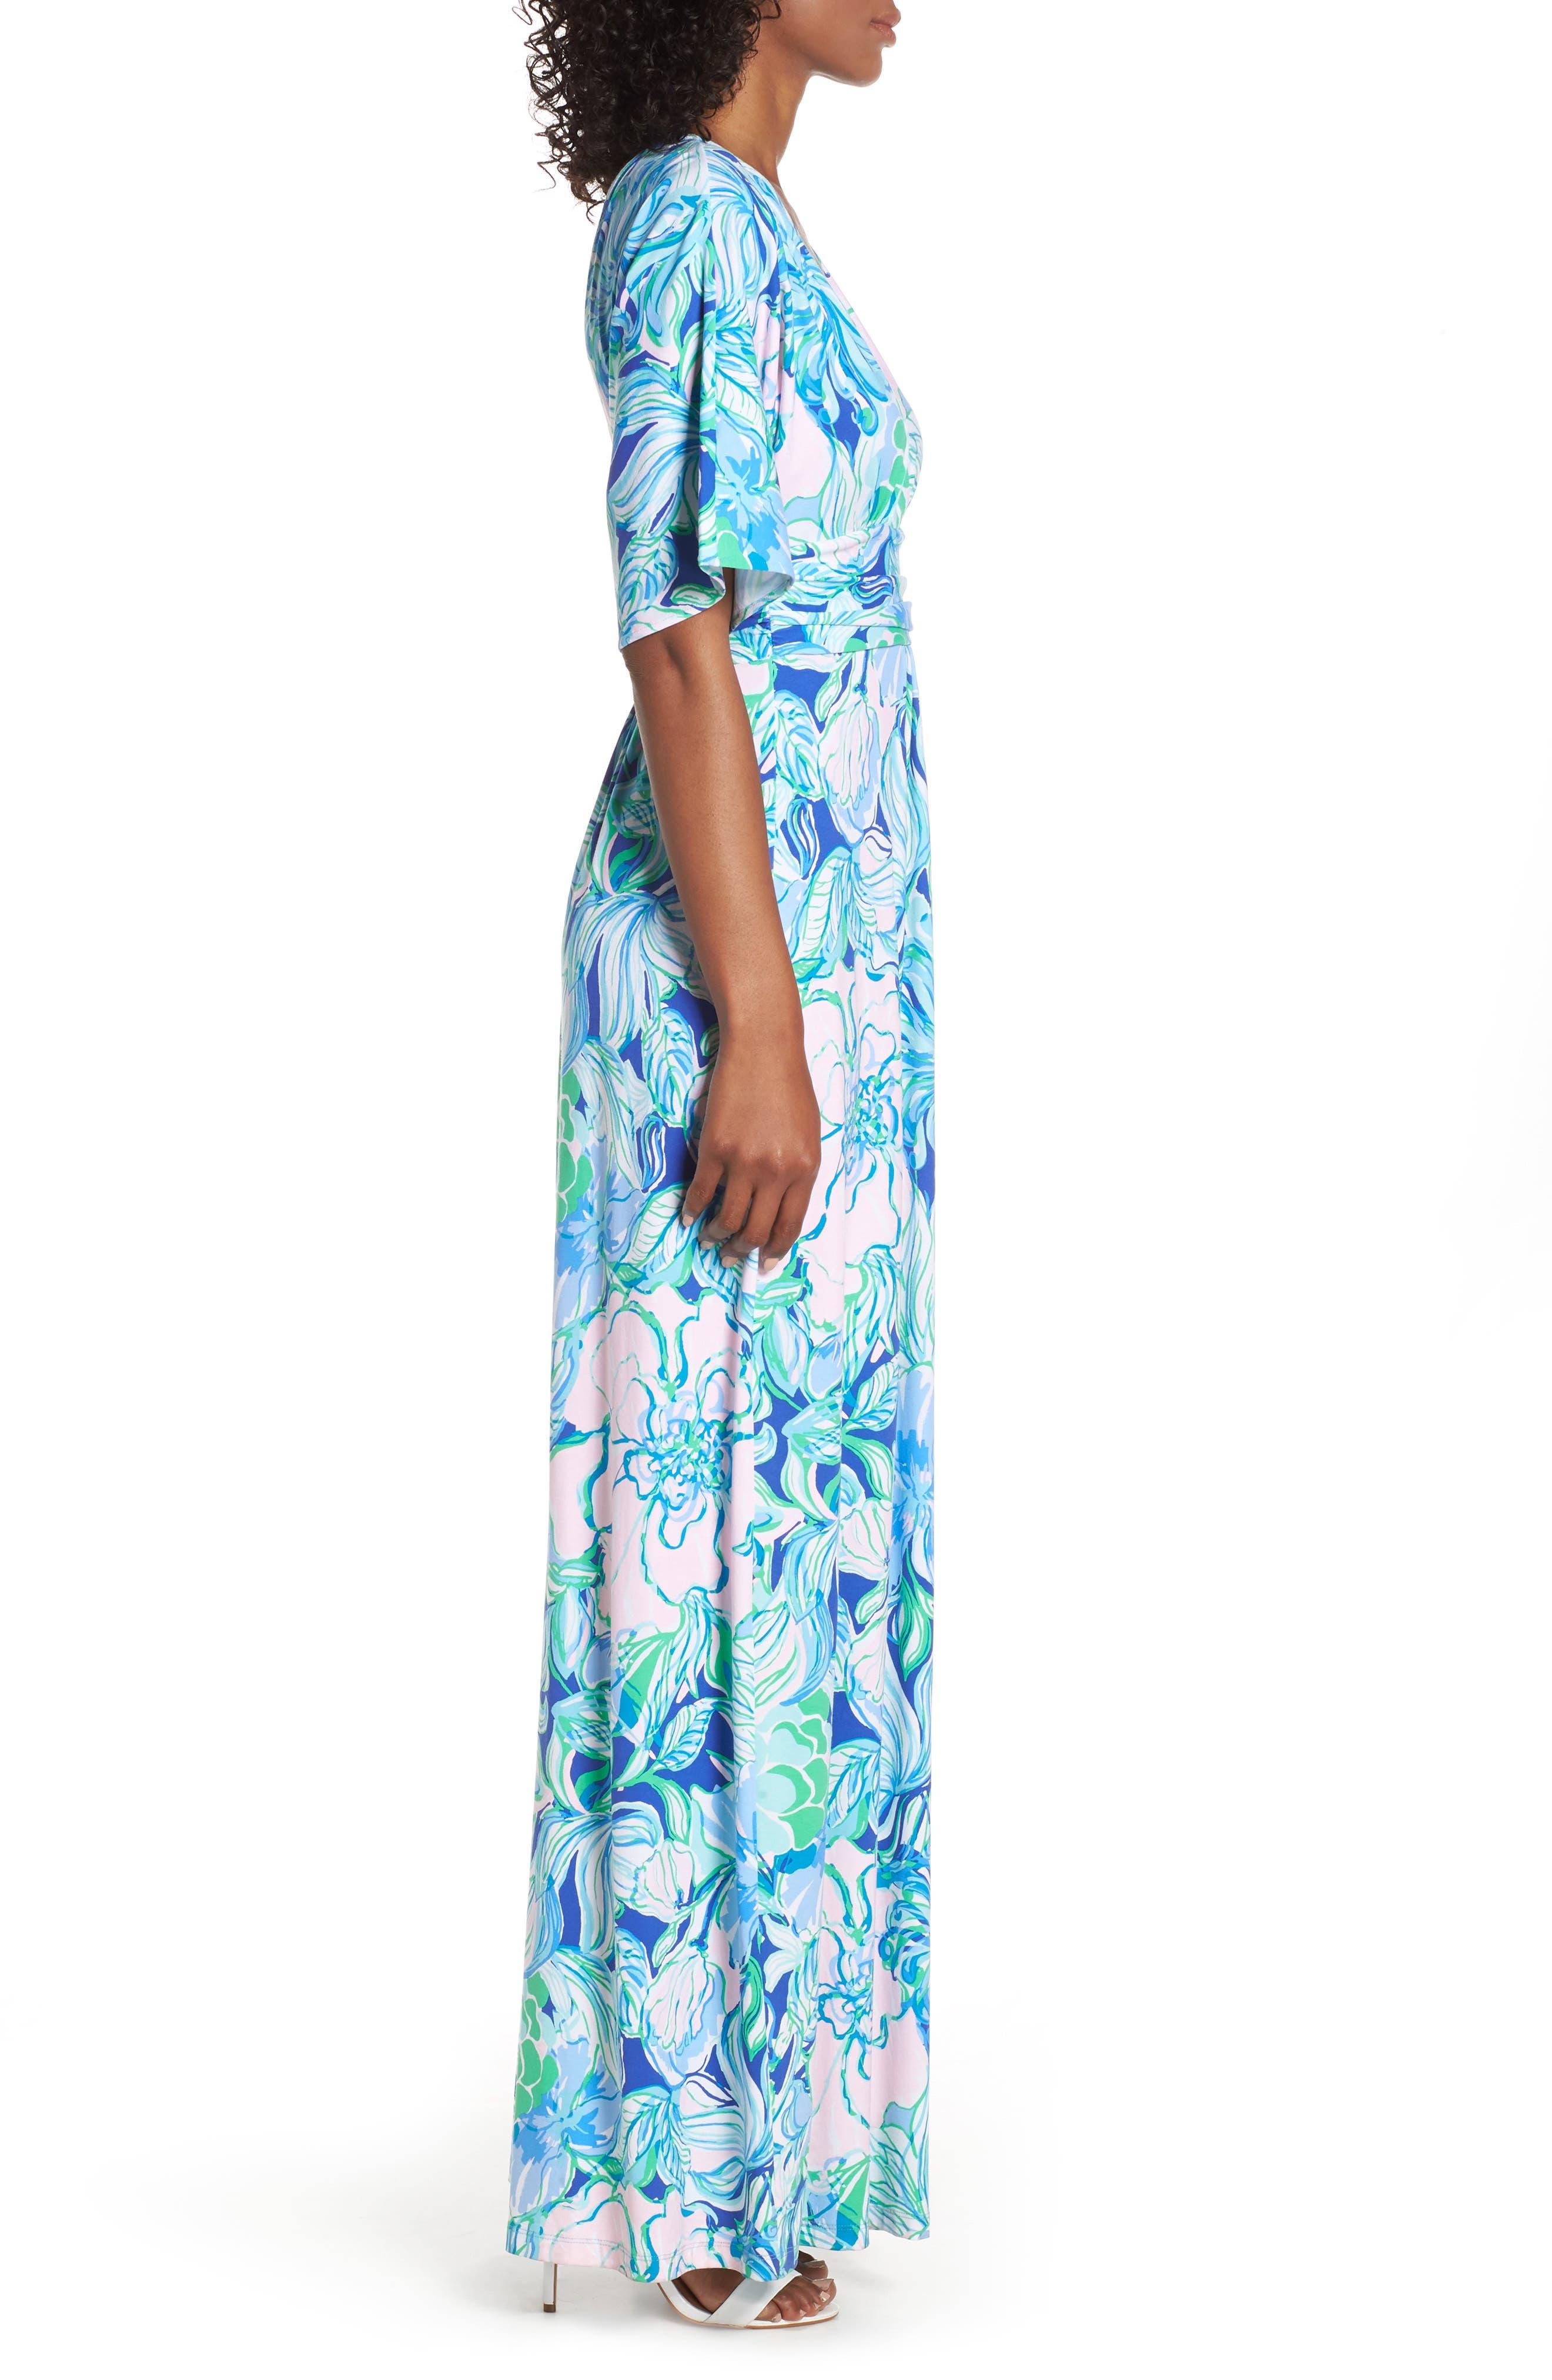 LILLY PULITZER<SUP>®</SUP>, Parigi Maxi Dress, Alternate thumbnail 3, color, MULTI PARTY THYME